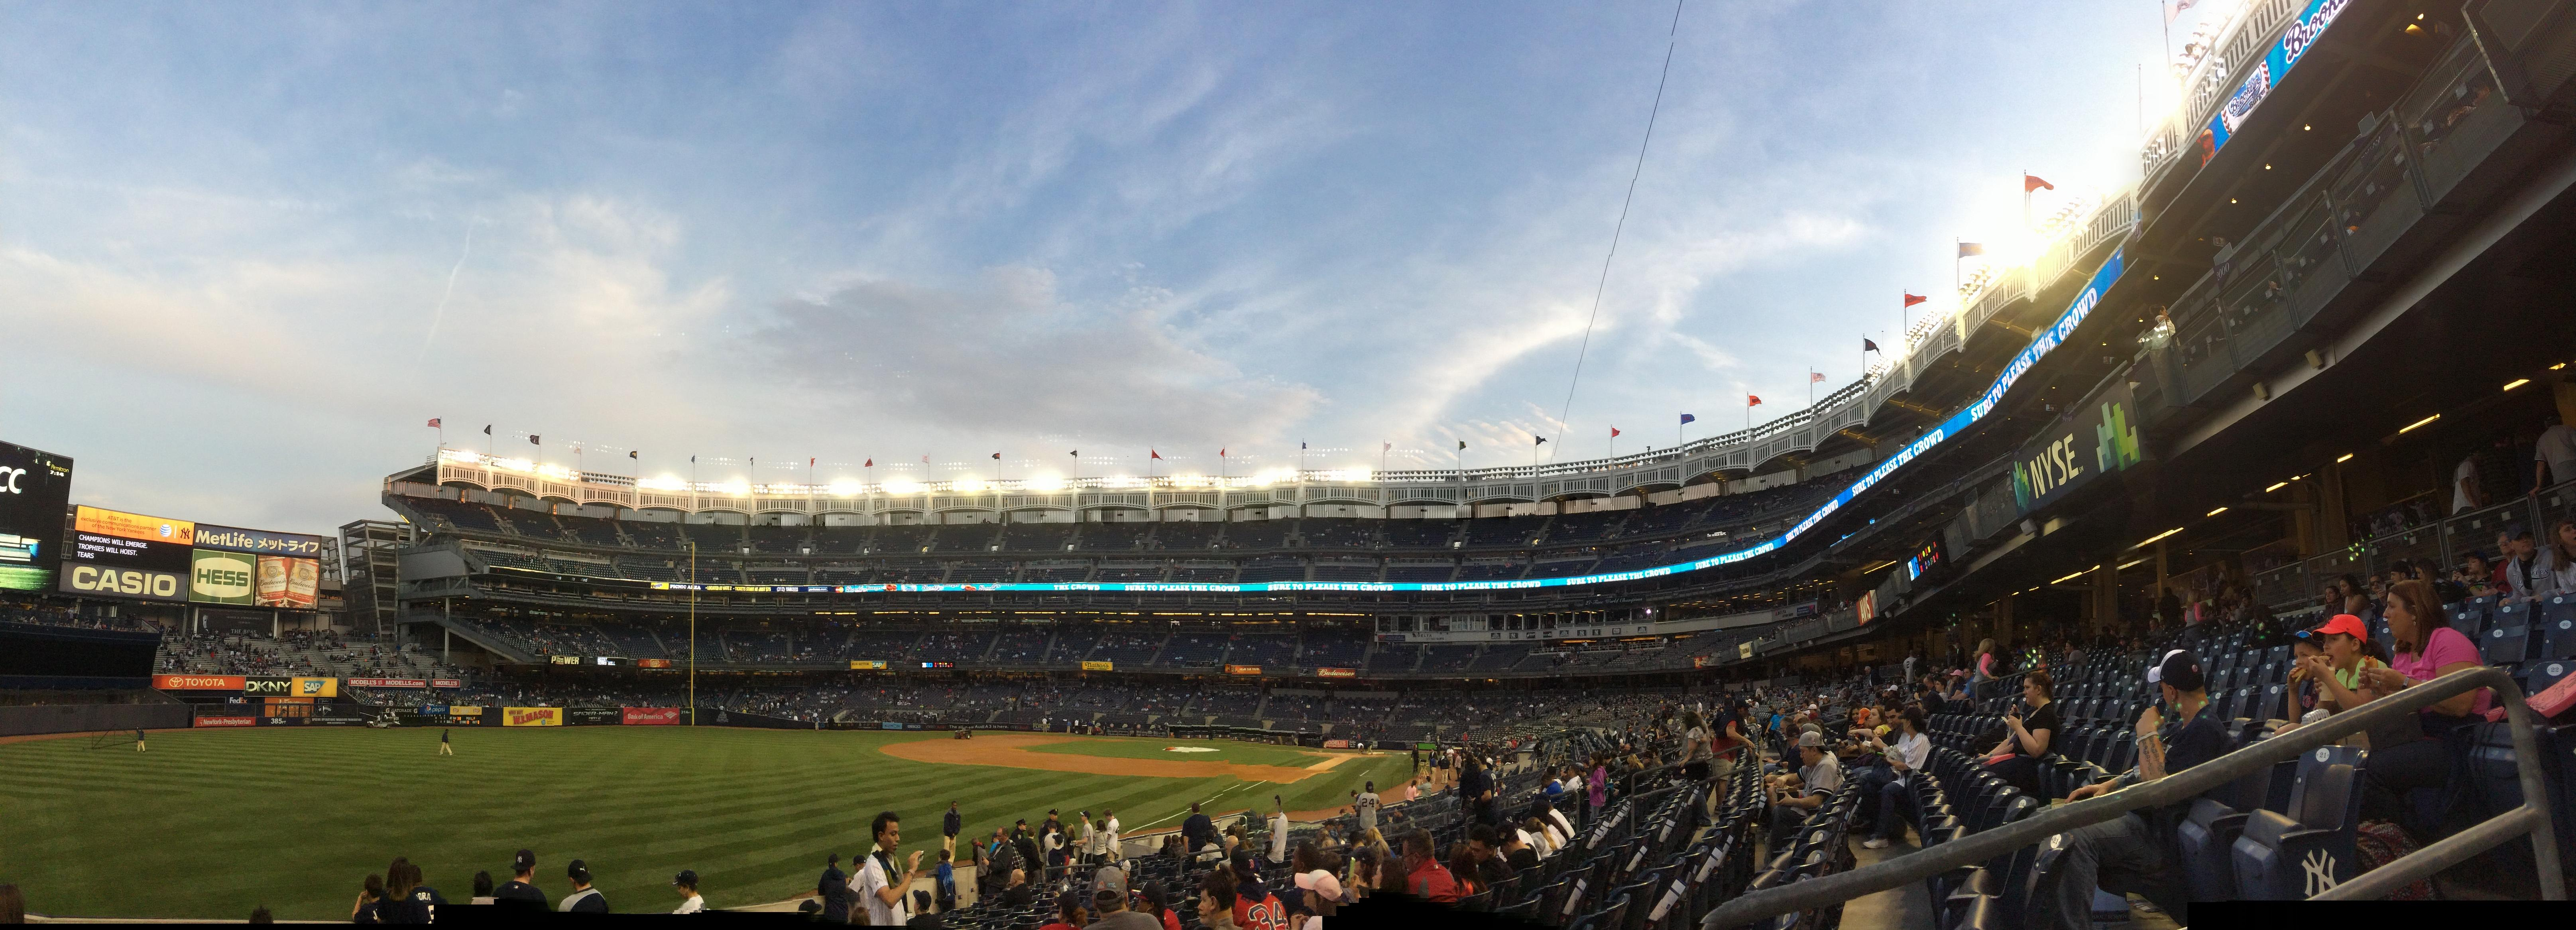 Yankee Stadium Section 131 Row 17 Seat 4